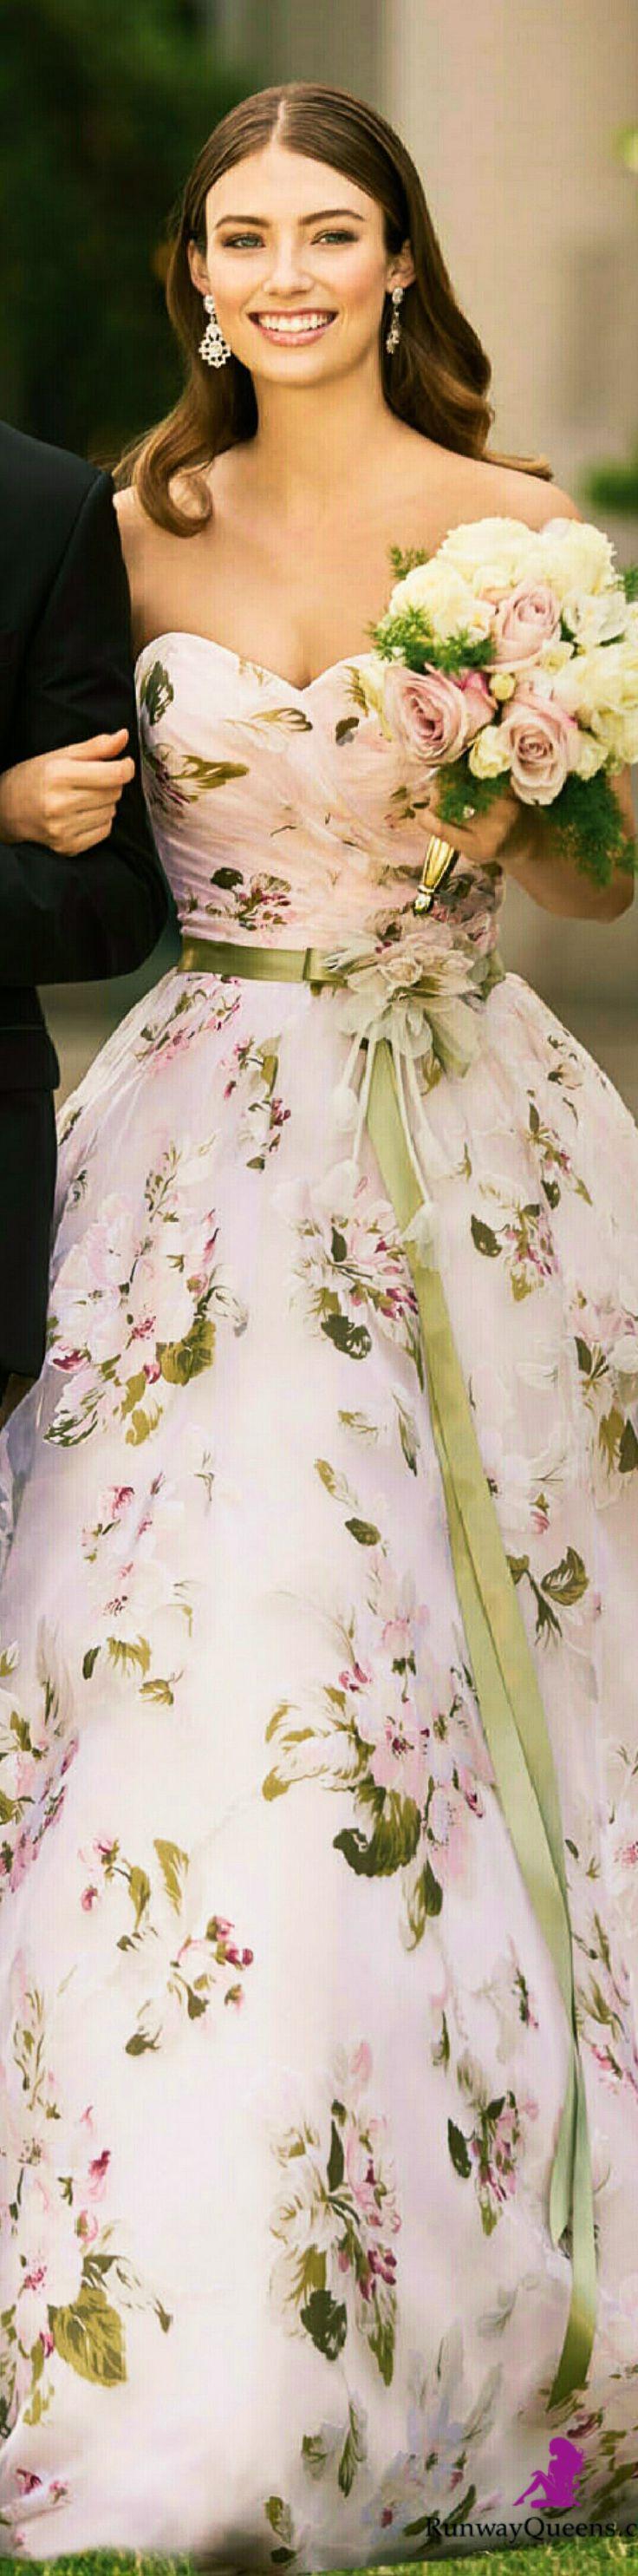 David Tutera, Bridal 2017, flowery, pink